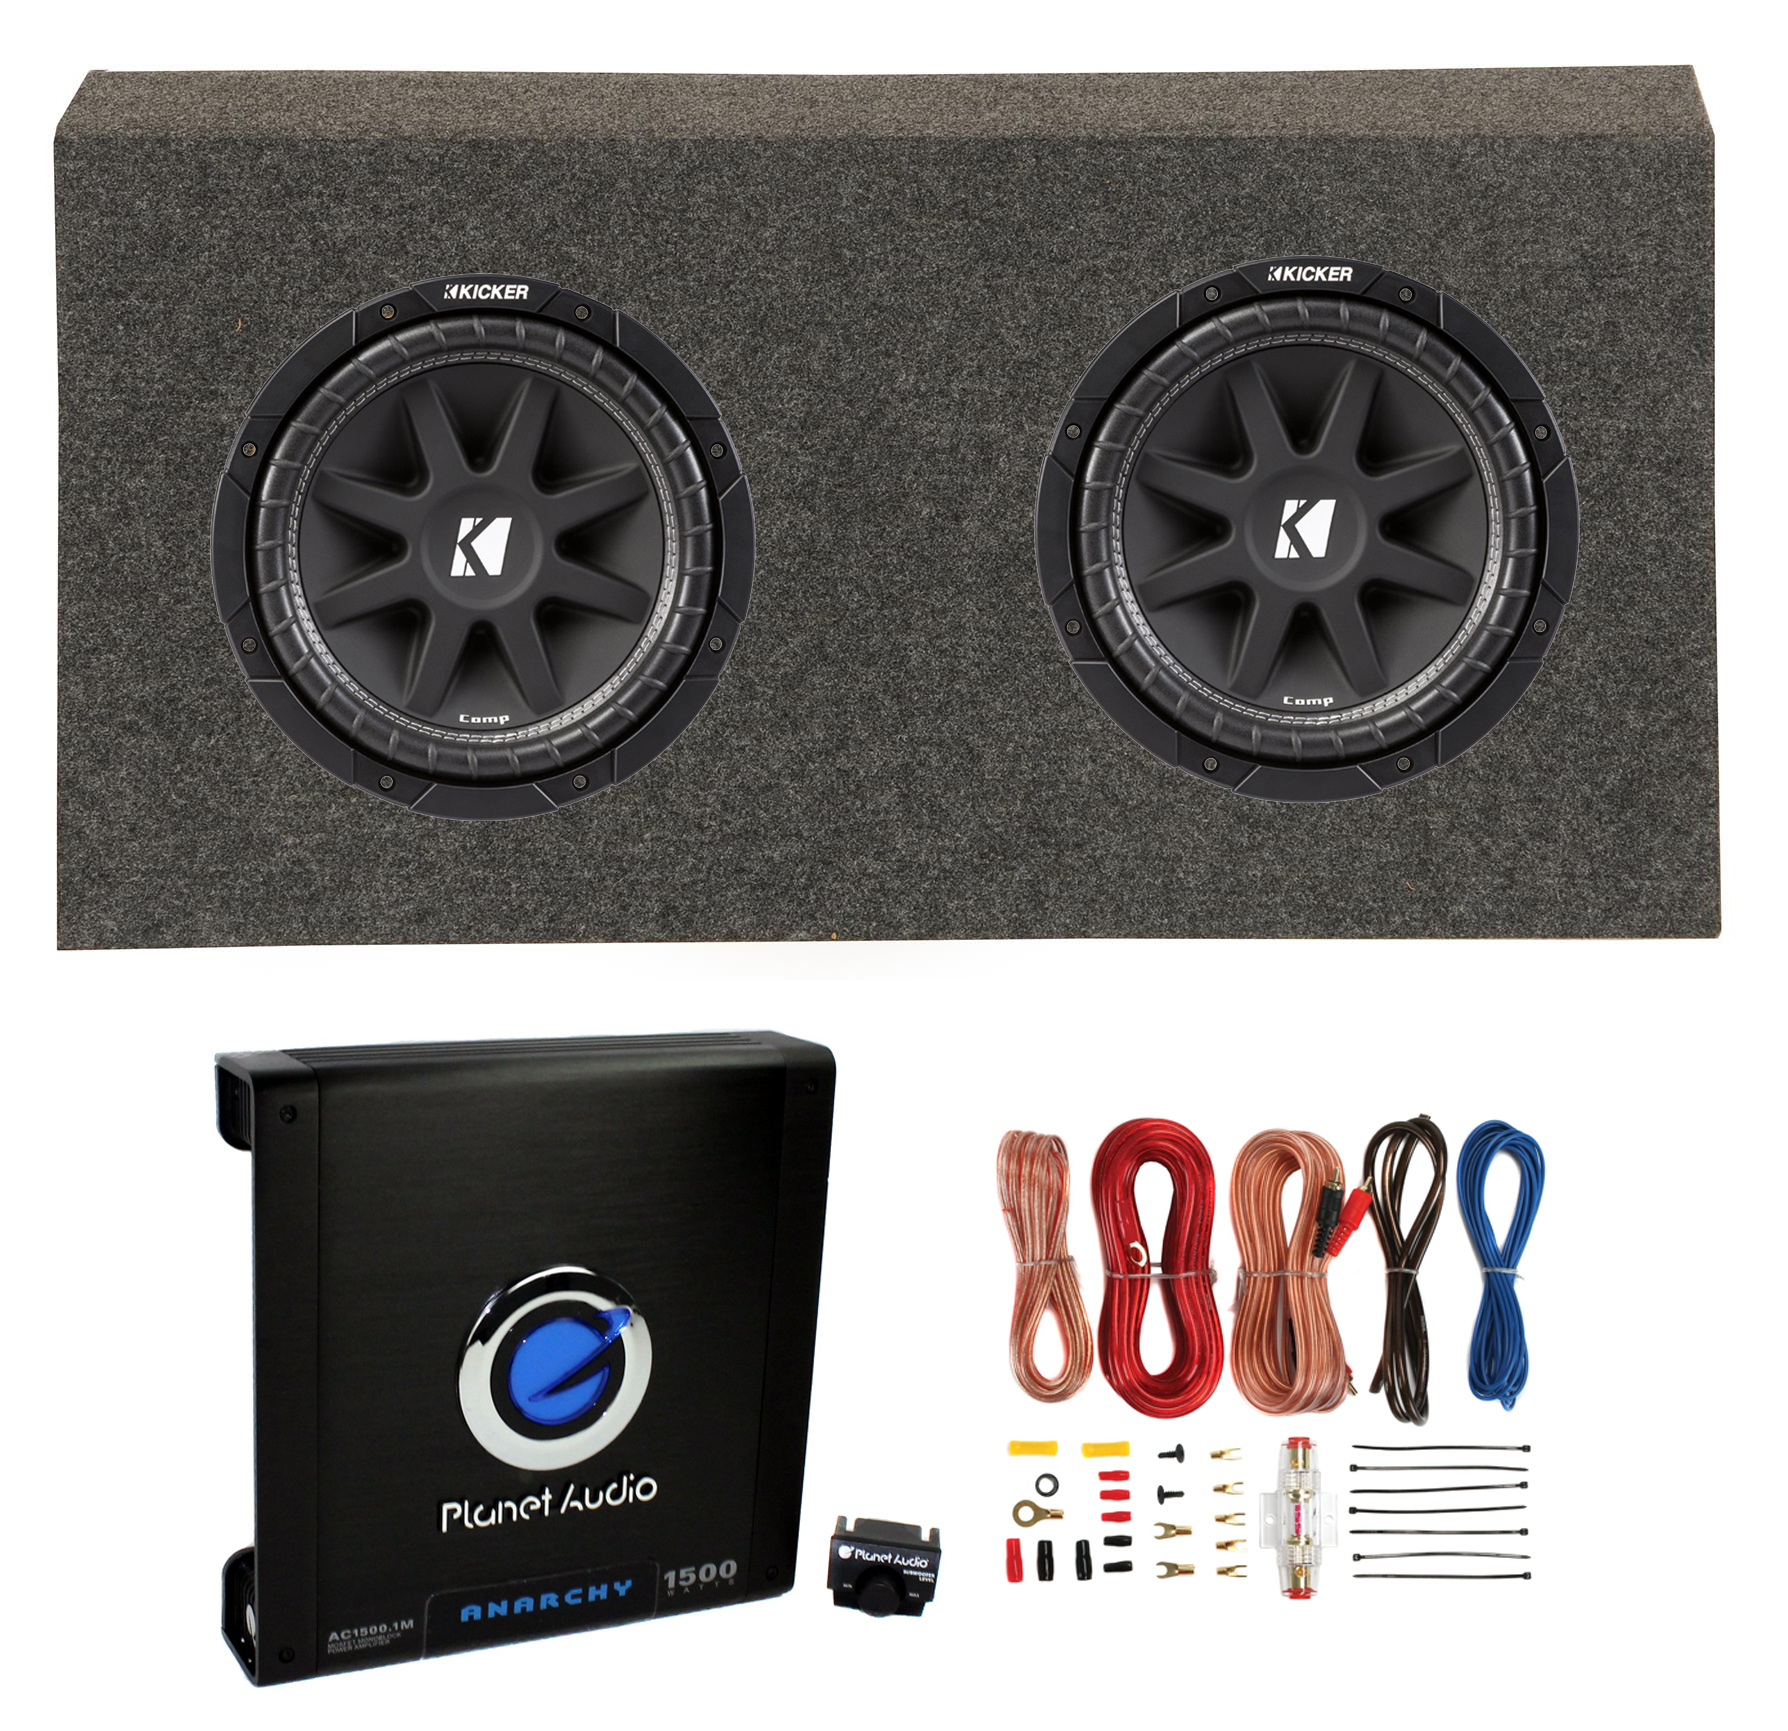 Kicker 12 Inch 600W Subwoofers (2) + Jeep Sub Box + Car Amplifier + ...